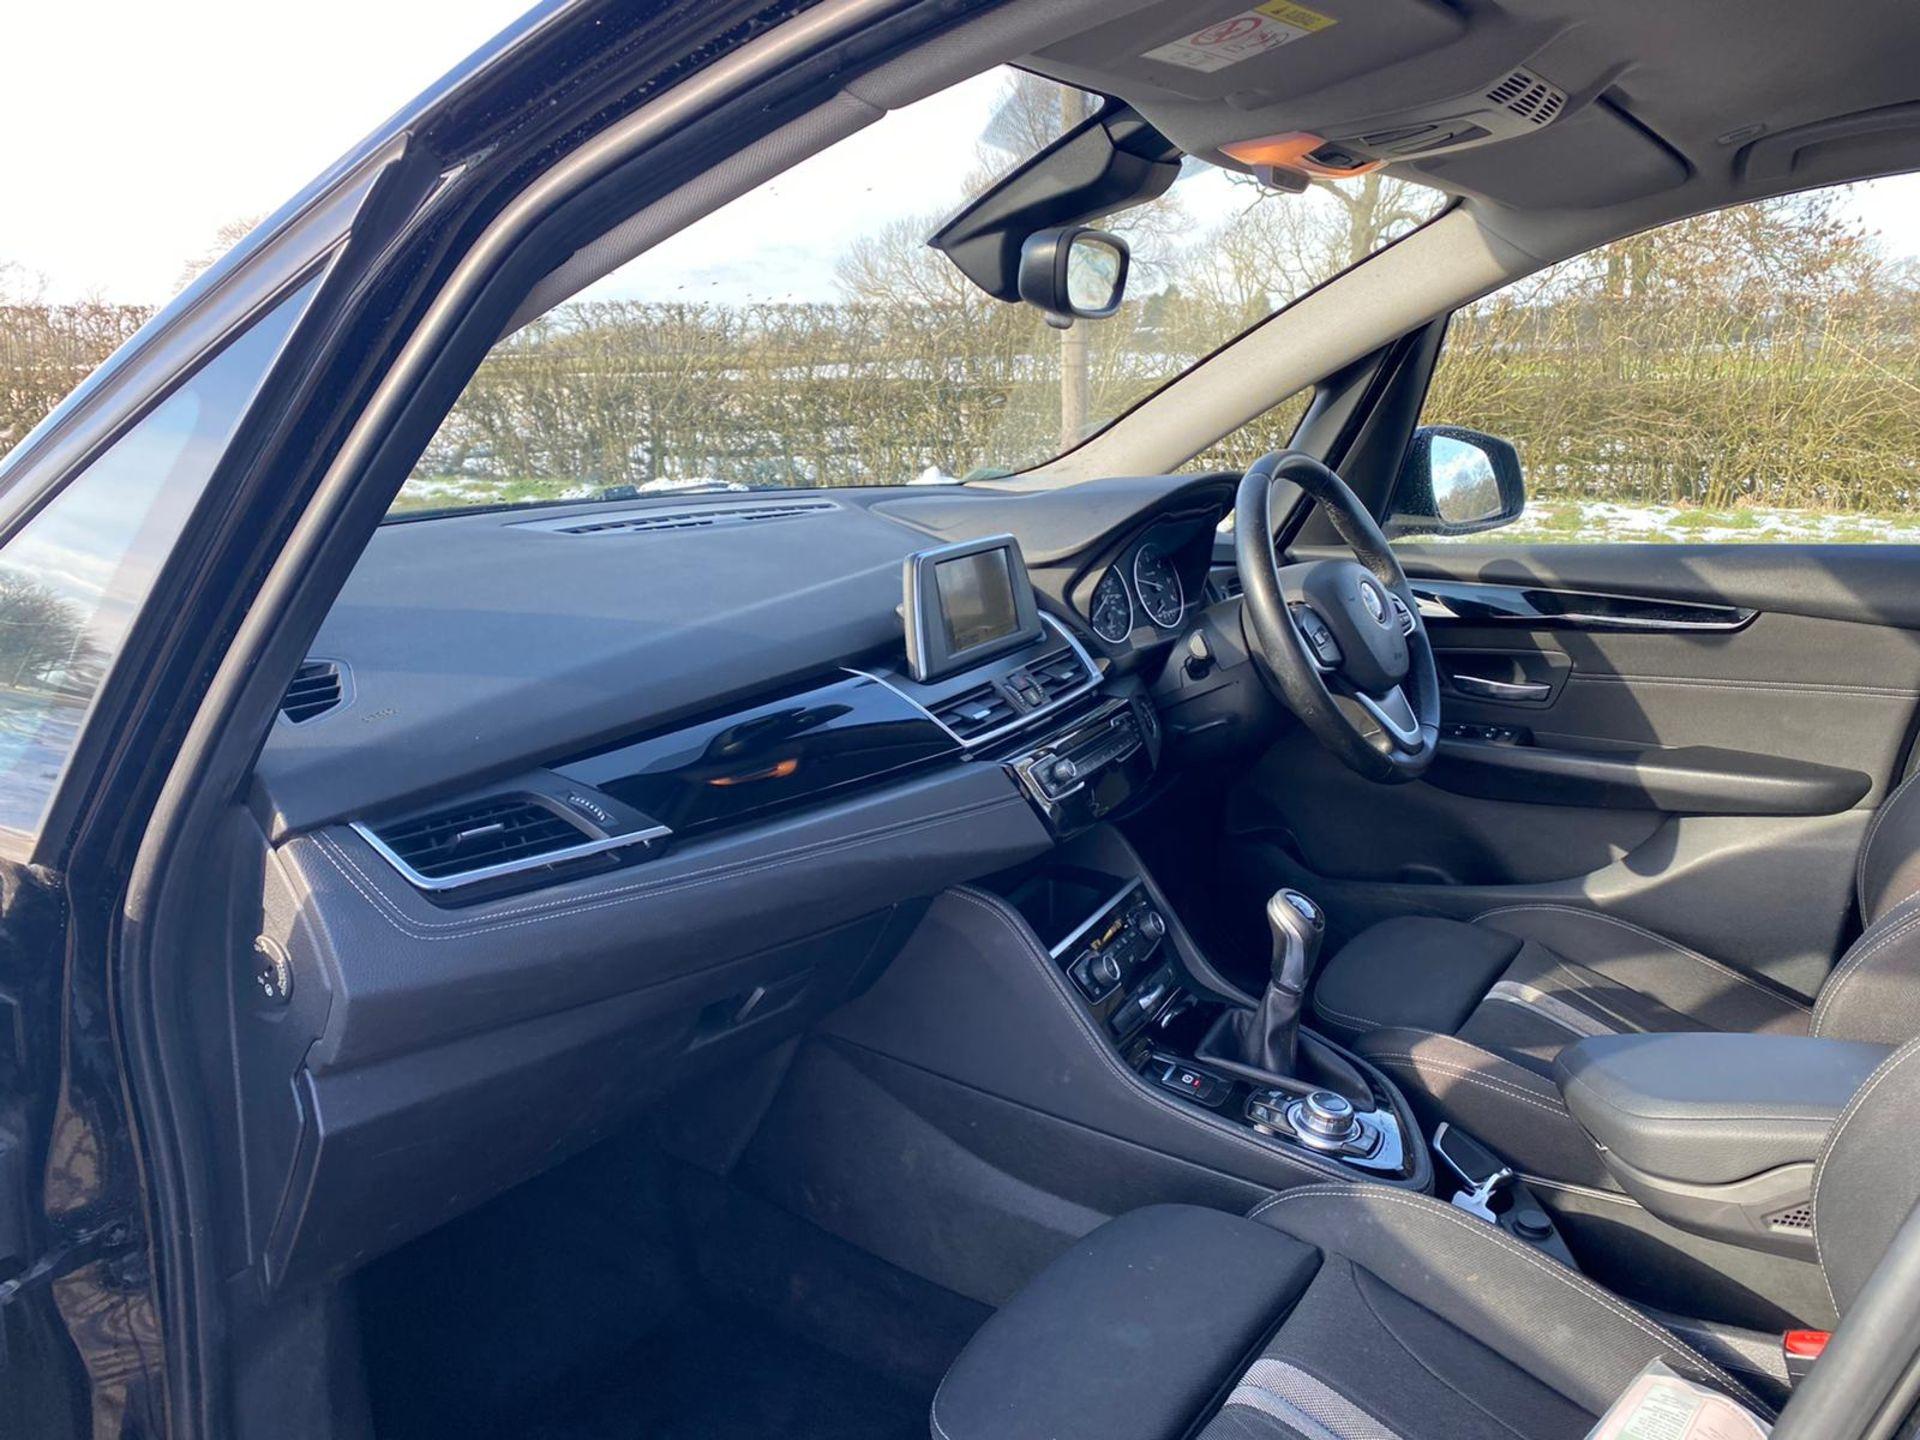 "ON SALE BMW 218d ""SPORT"" MPV 2.0 DIESEL ""EURO 6"" (2016 REG) - 1 OWNER - GREAT SPEC - BLACK - LOOK!! - Image 12 of 16"